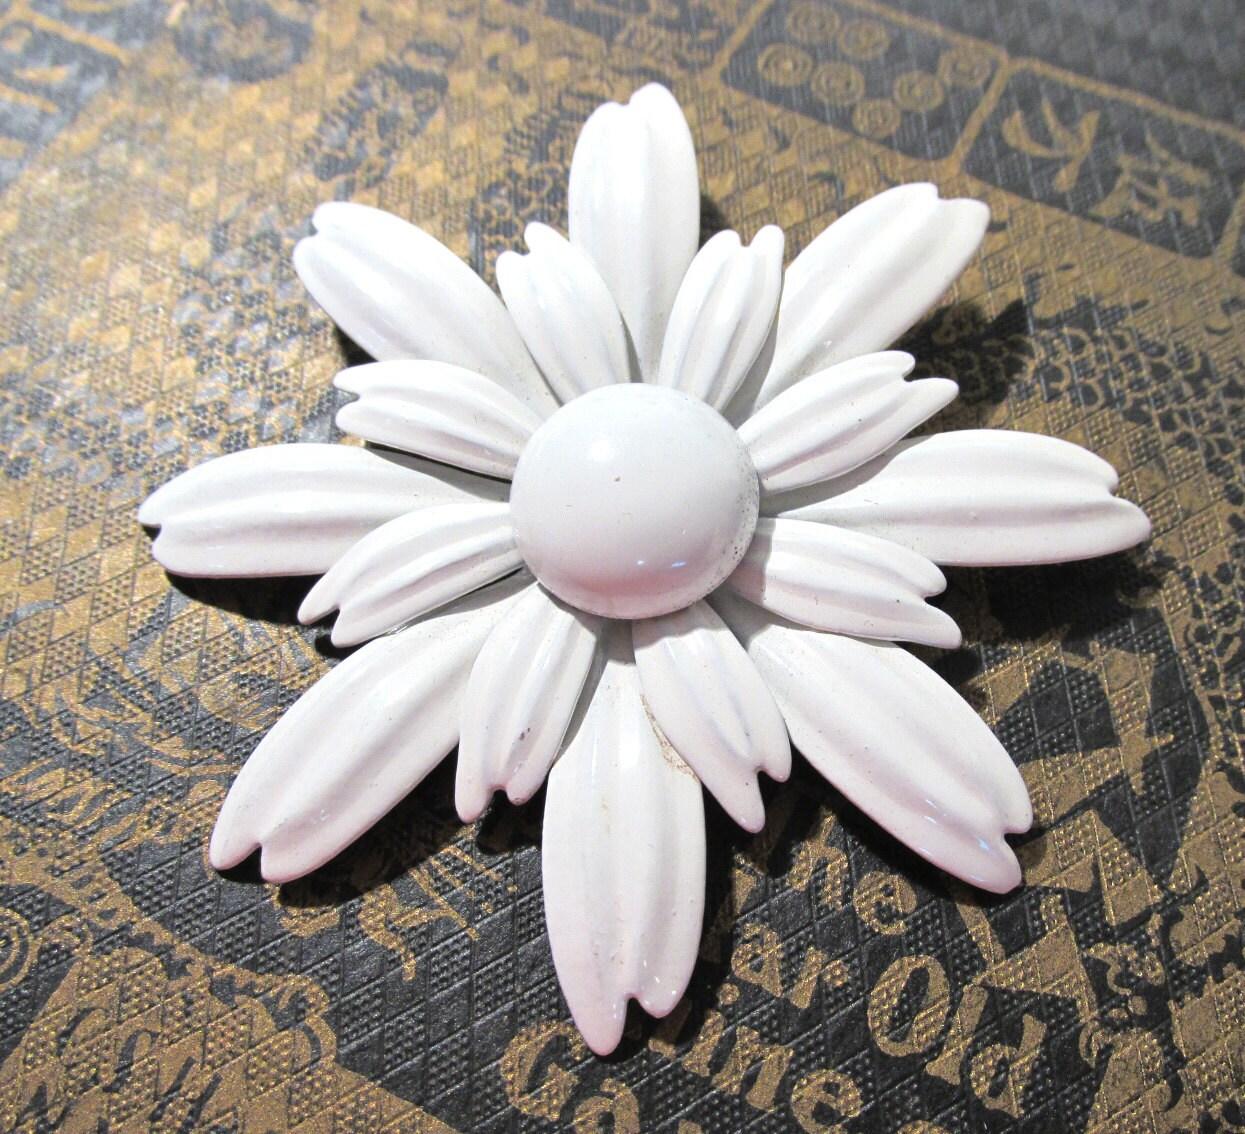 Enamel Flower Pin Vintage Large White Enamel Pin Brooch Flower